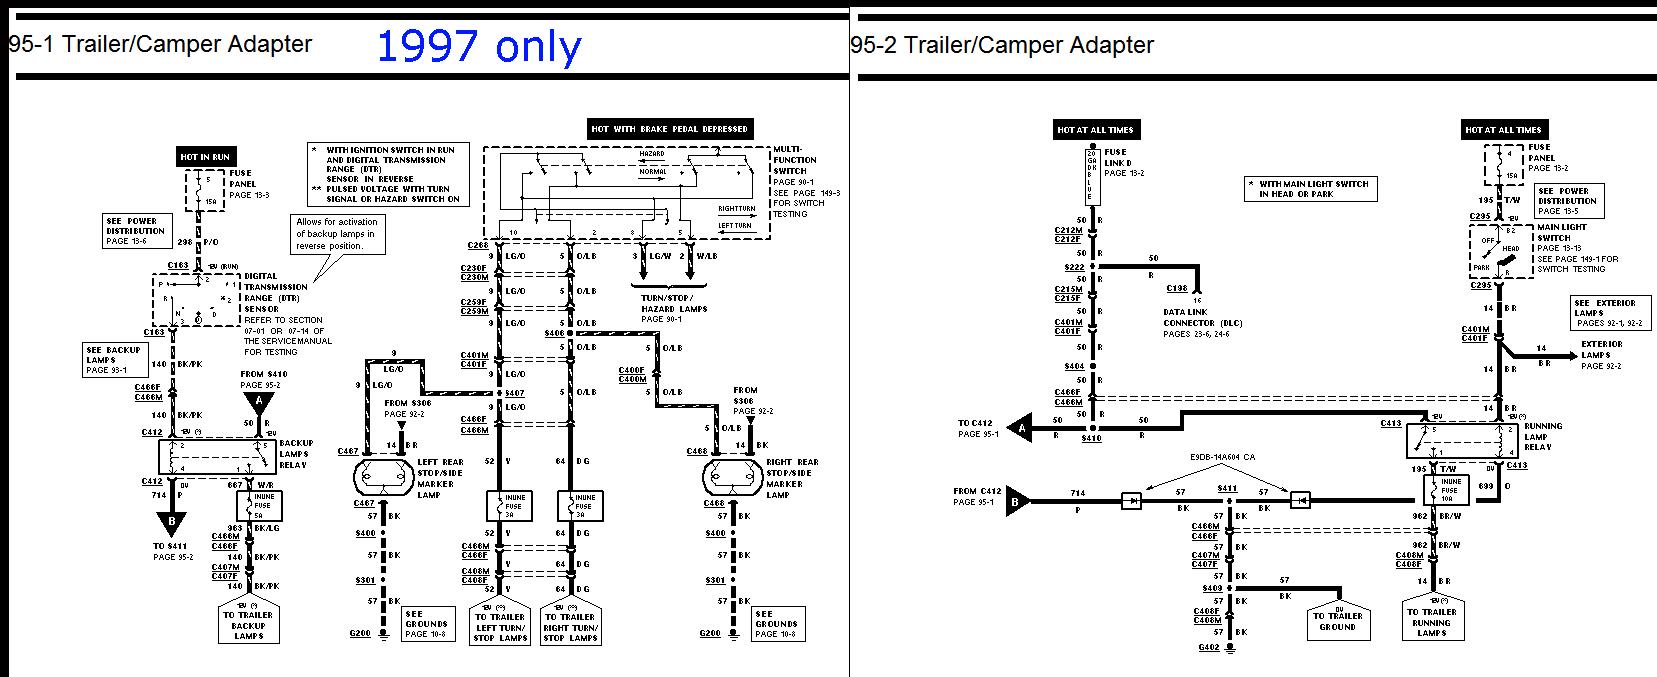 [DIAGRAM_38EU]  KA_4000] 1996 Ford F250 Wiring Diagram | 1996 Ford F250 Wiring Schematic |  | Papxe Xero Mohammedshrine Librar Wiring 101